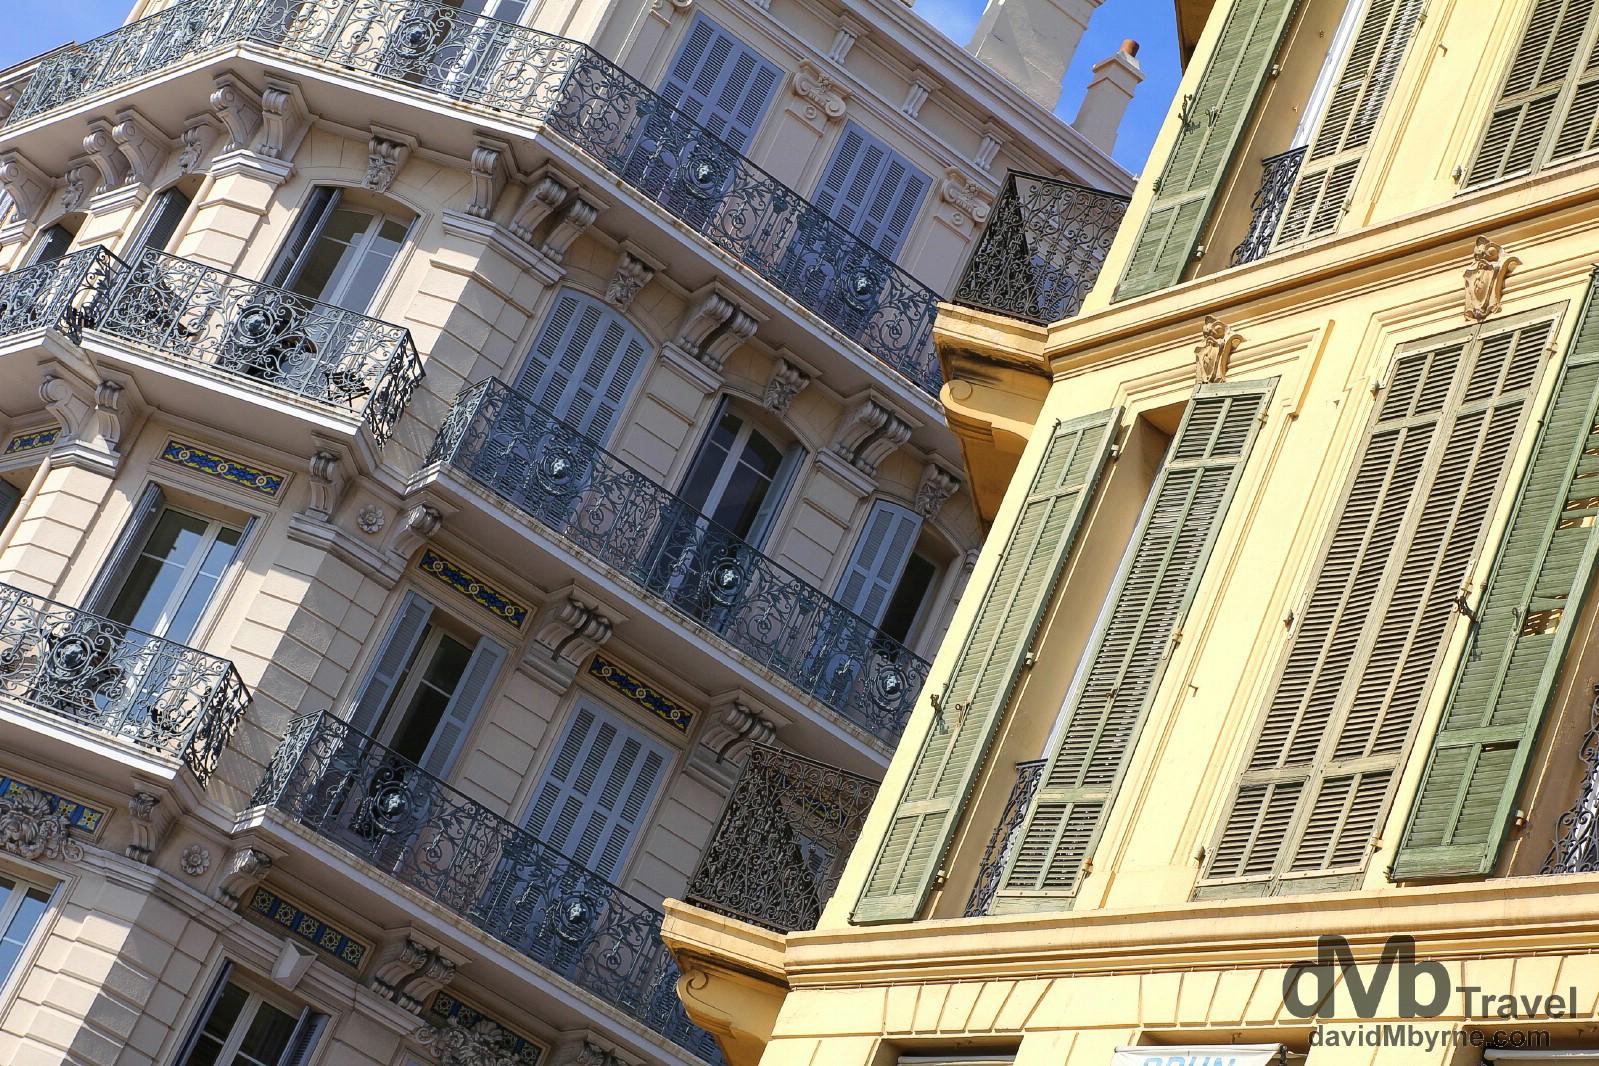 Buildings on Rue Felix Faure in Cannes, Côte d'Azur, France. March 15th, 2014.